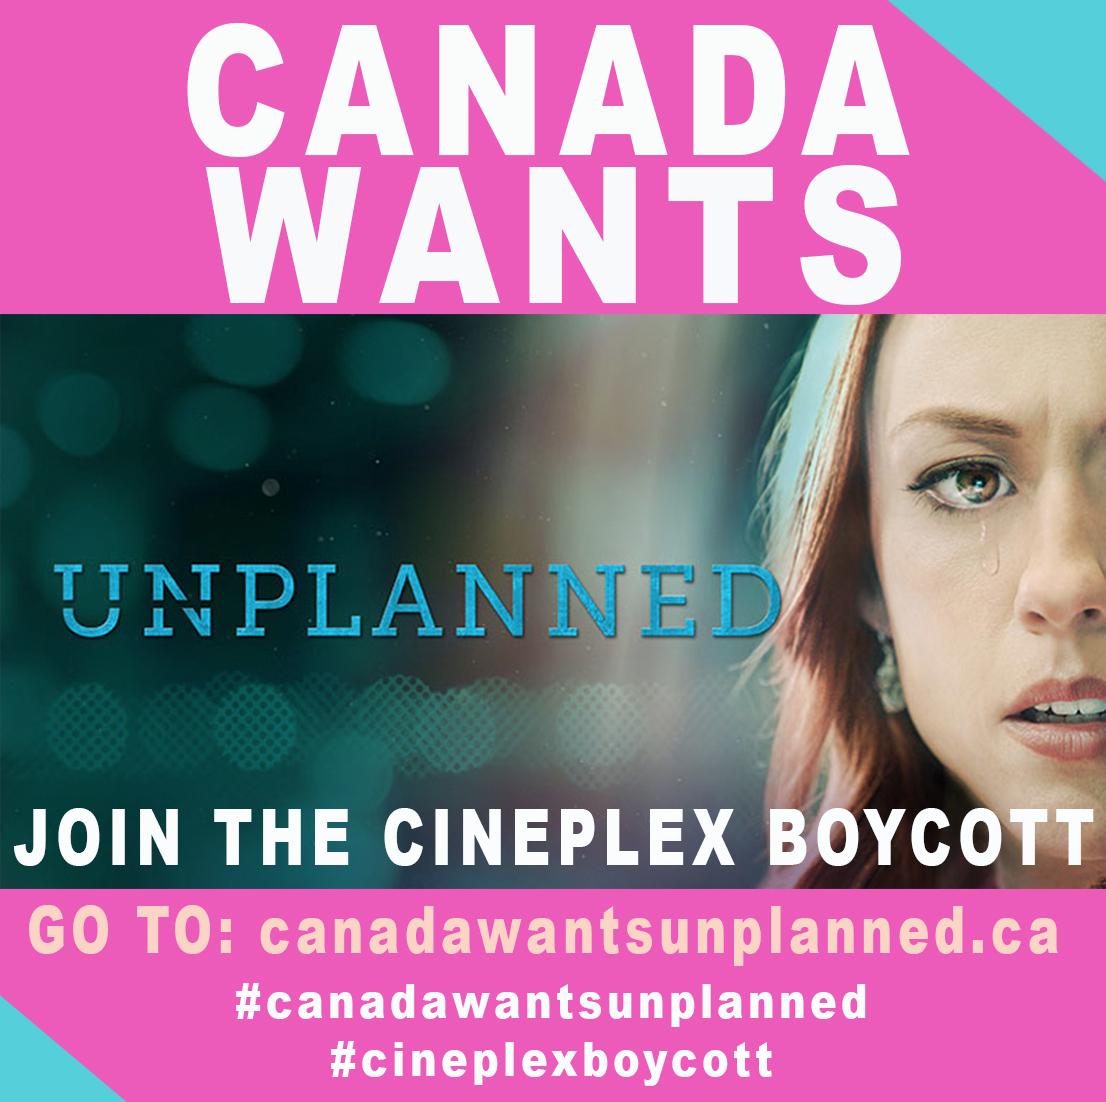 CanadaWantsUnplannedInsta2